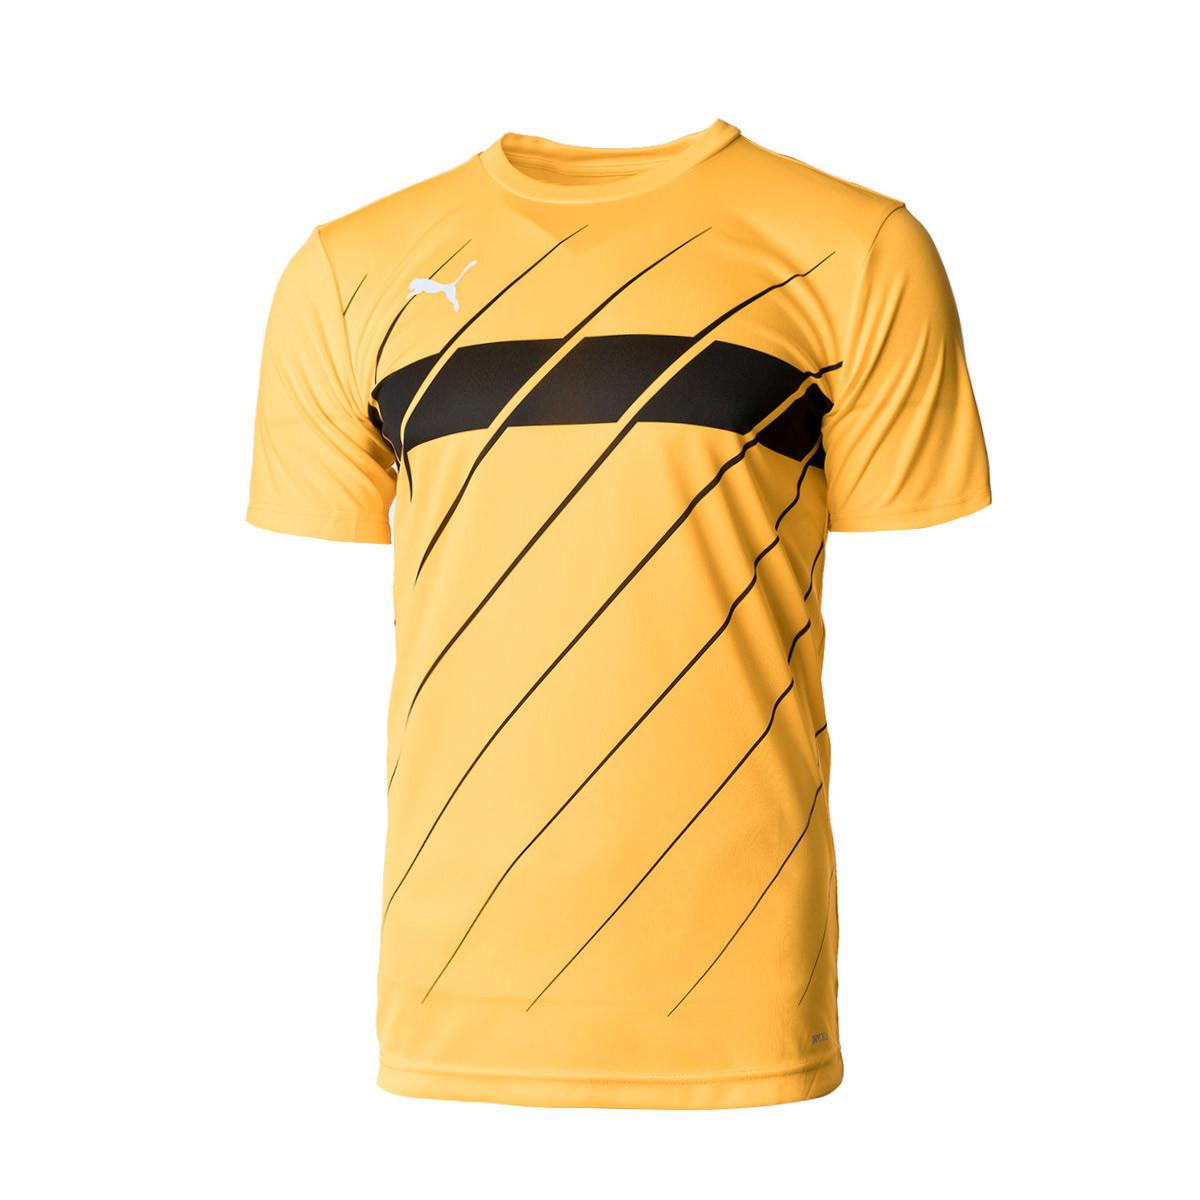 Puma ftblPLAY Graphic Shirt Jersey